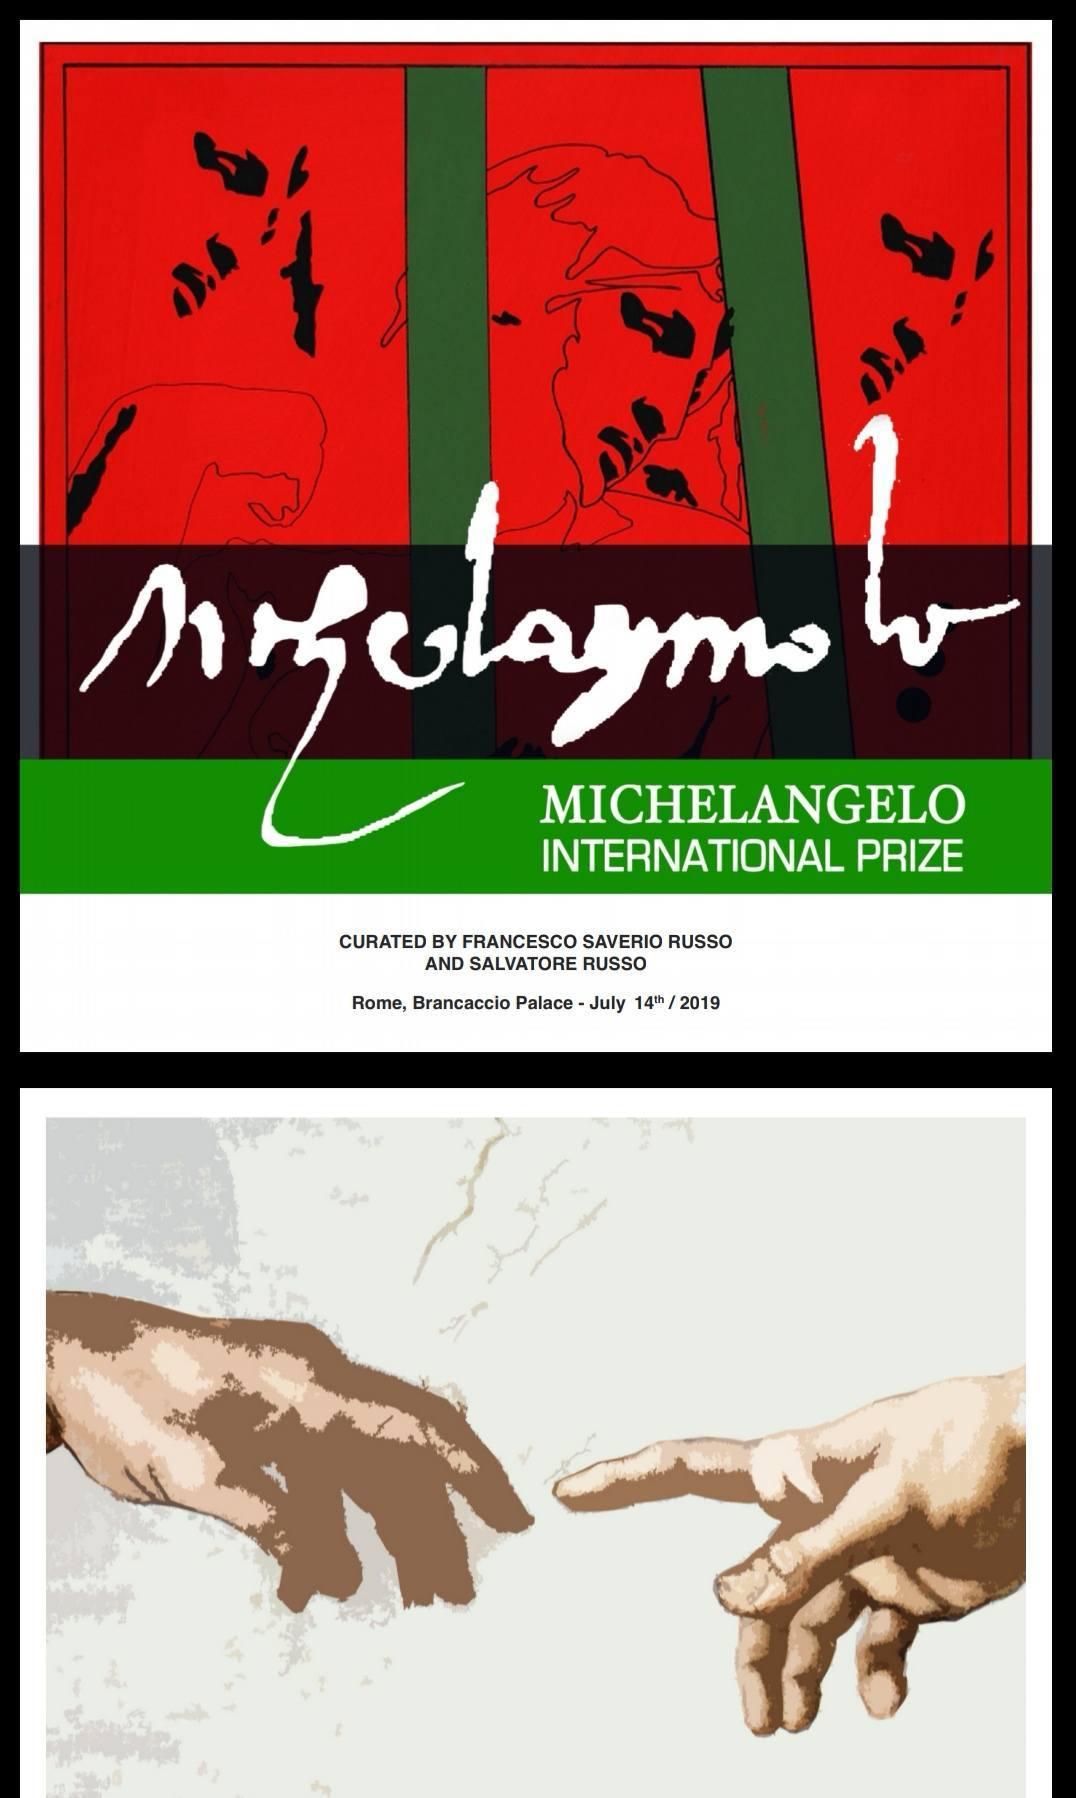 Jarl Goli awarded with the International Prize MICHELANGELO, Rome 2019